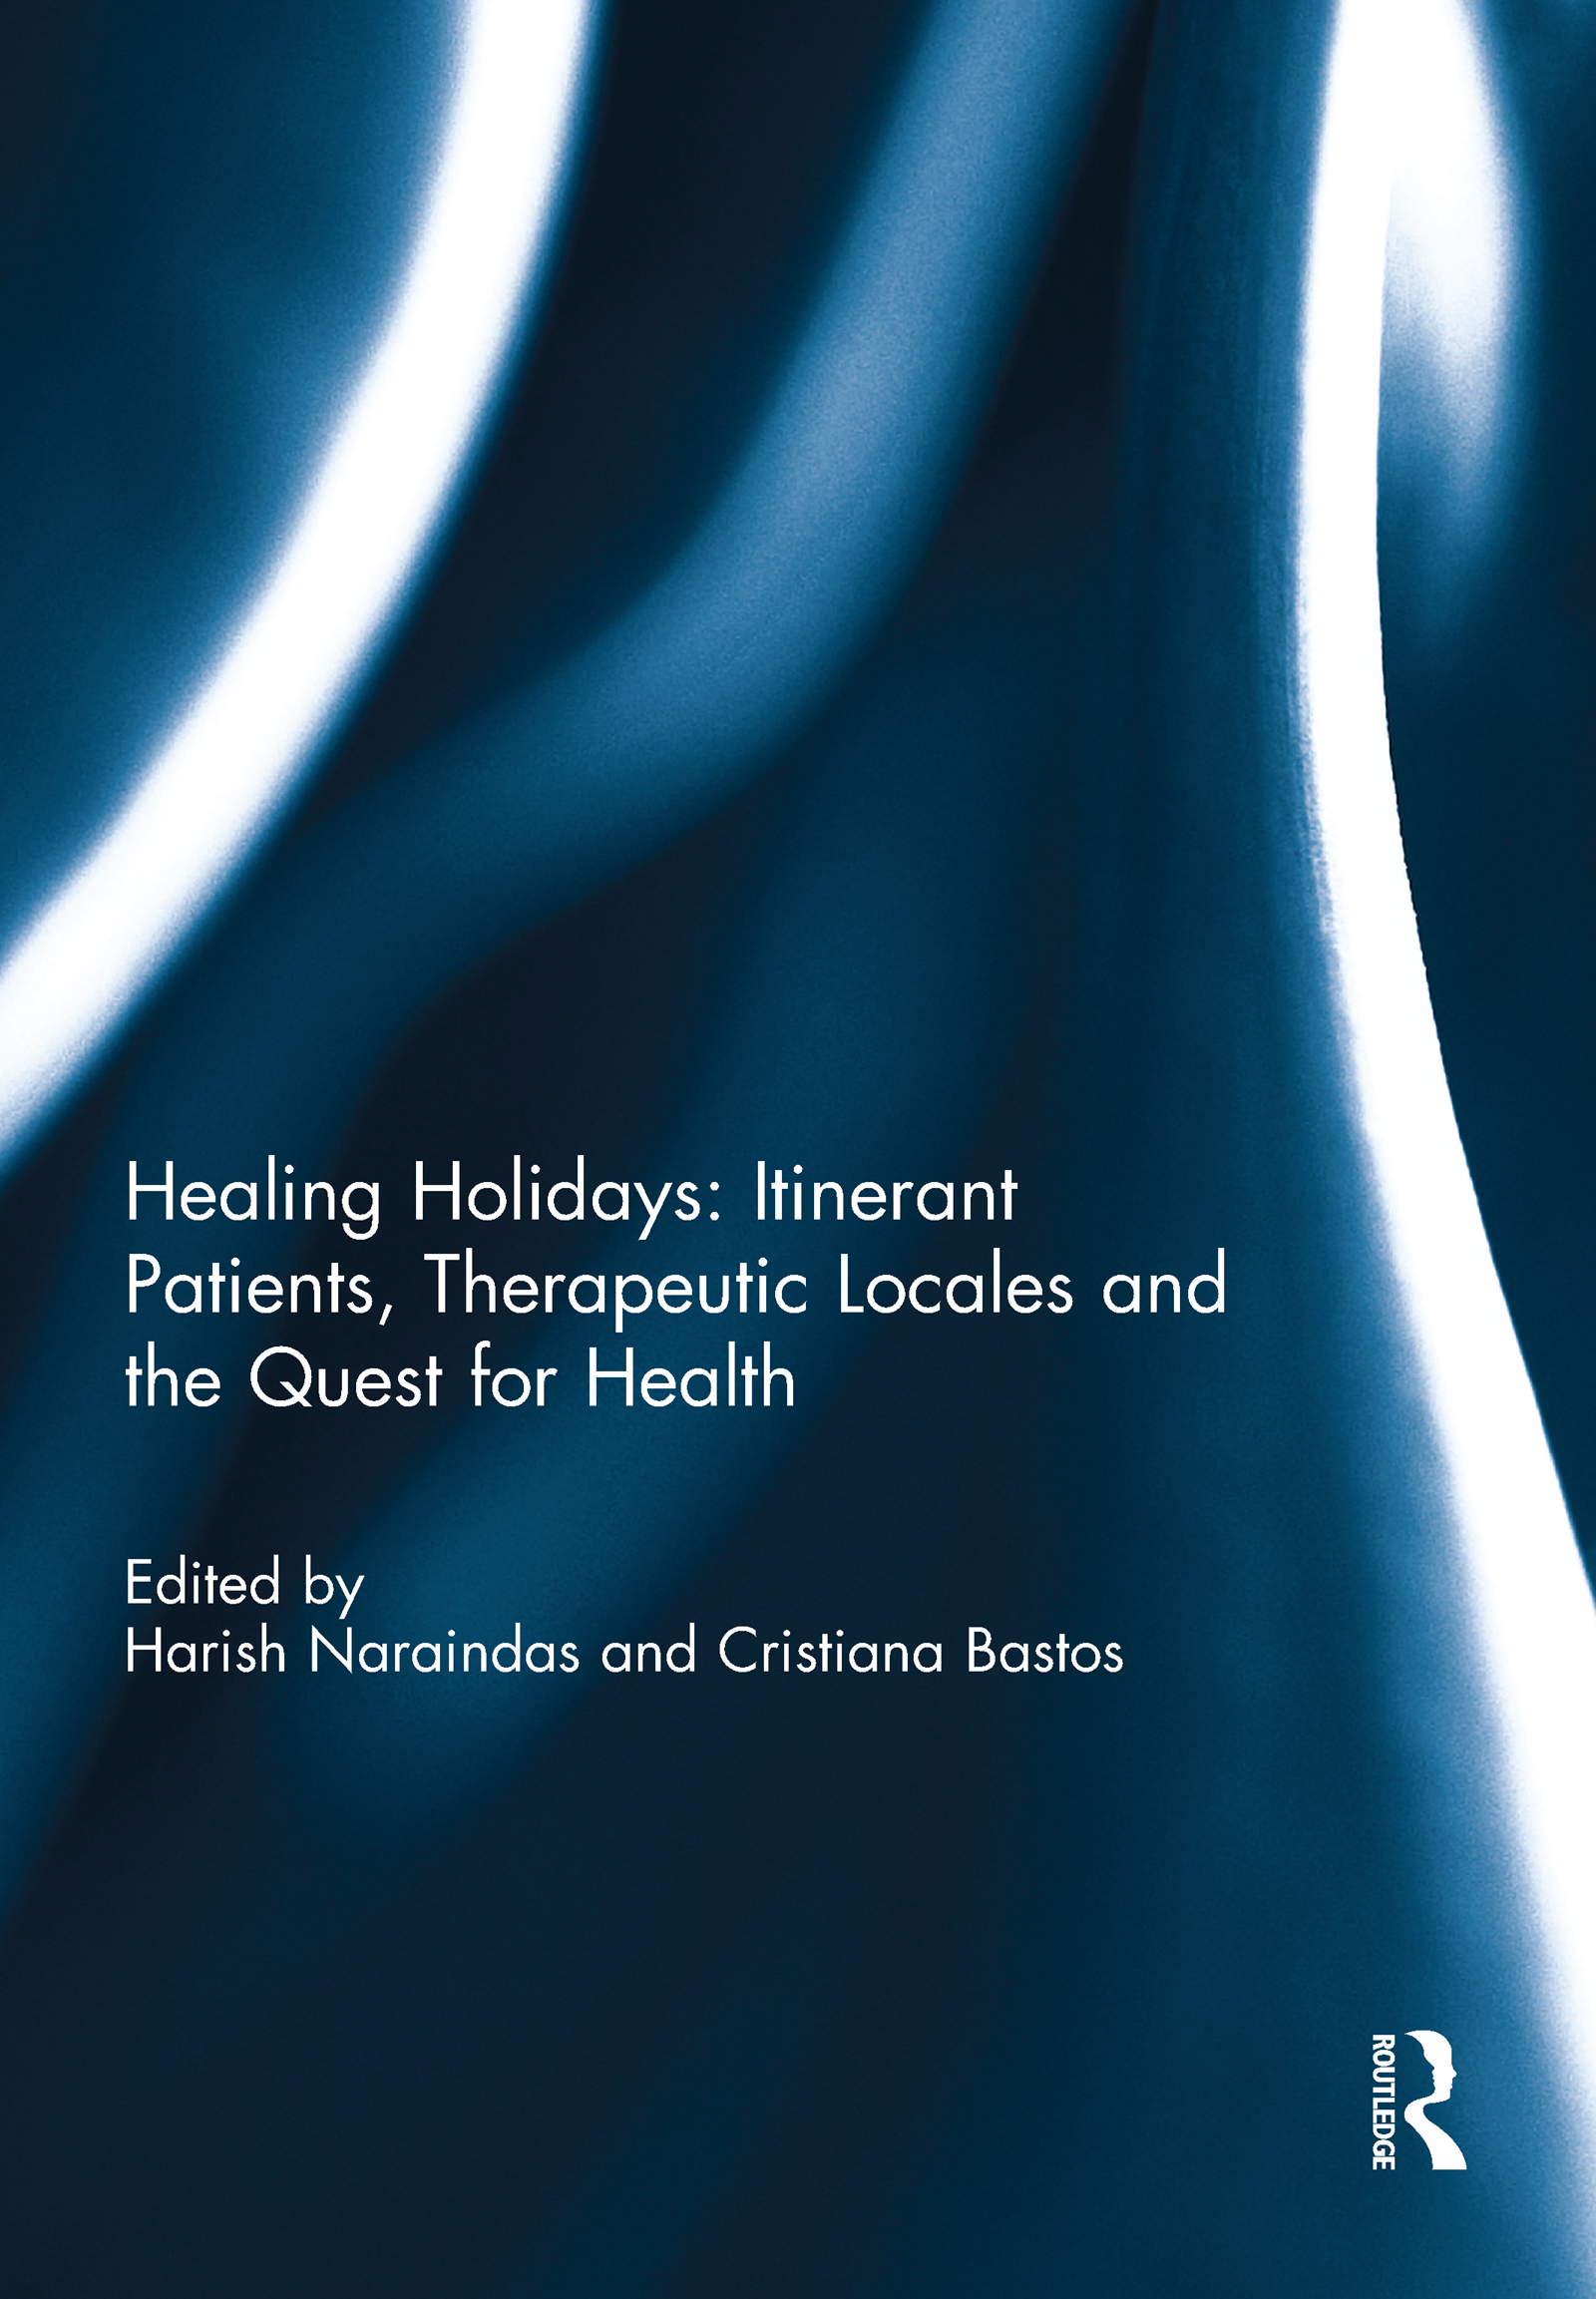 Healing Holidays